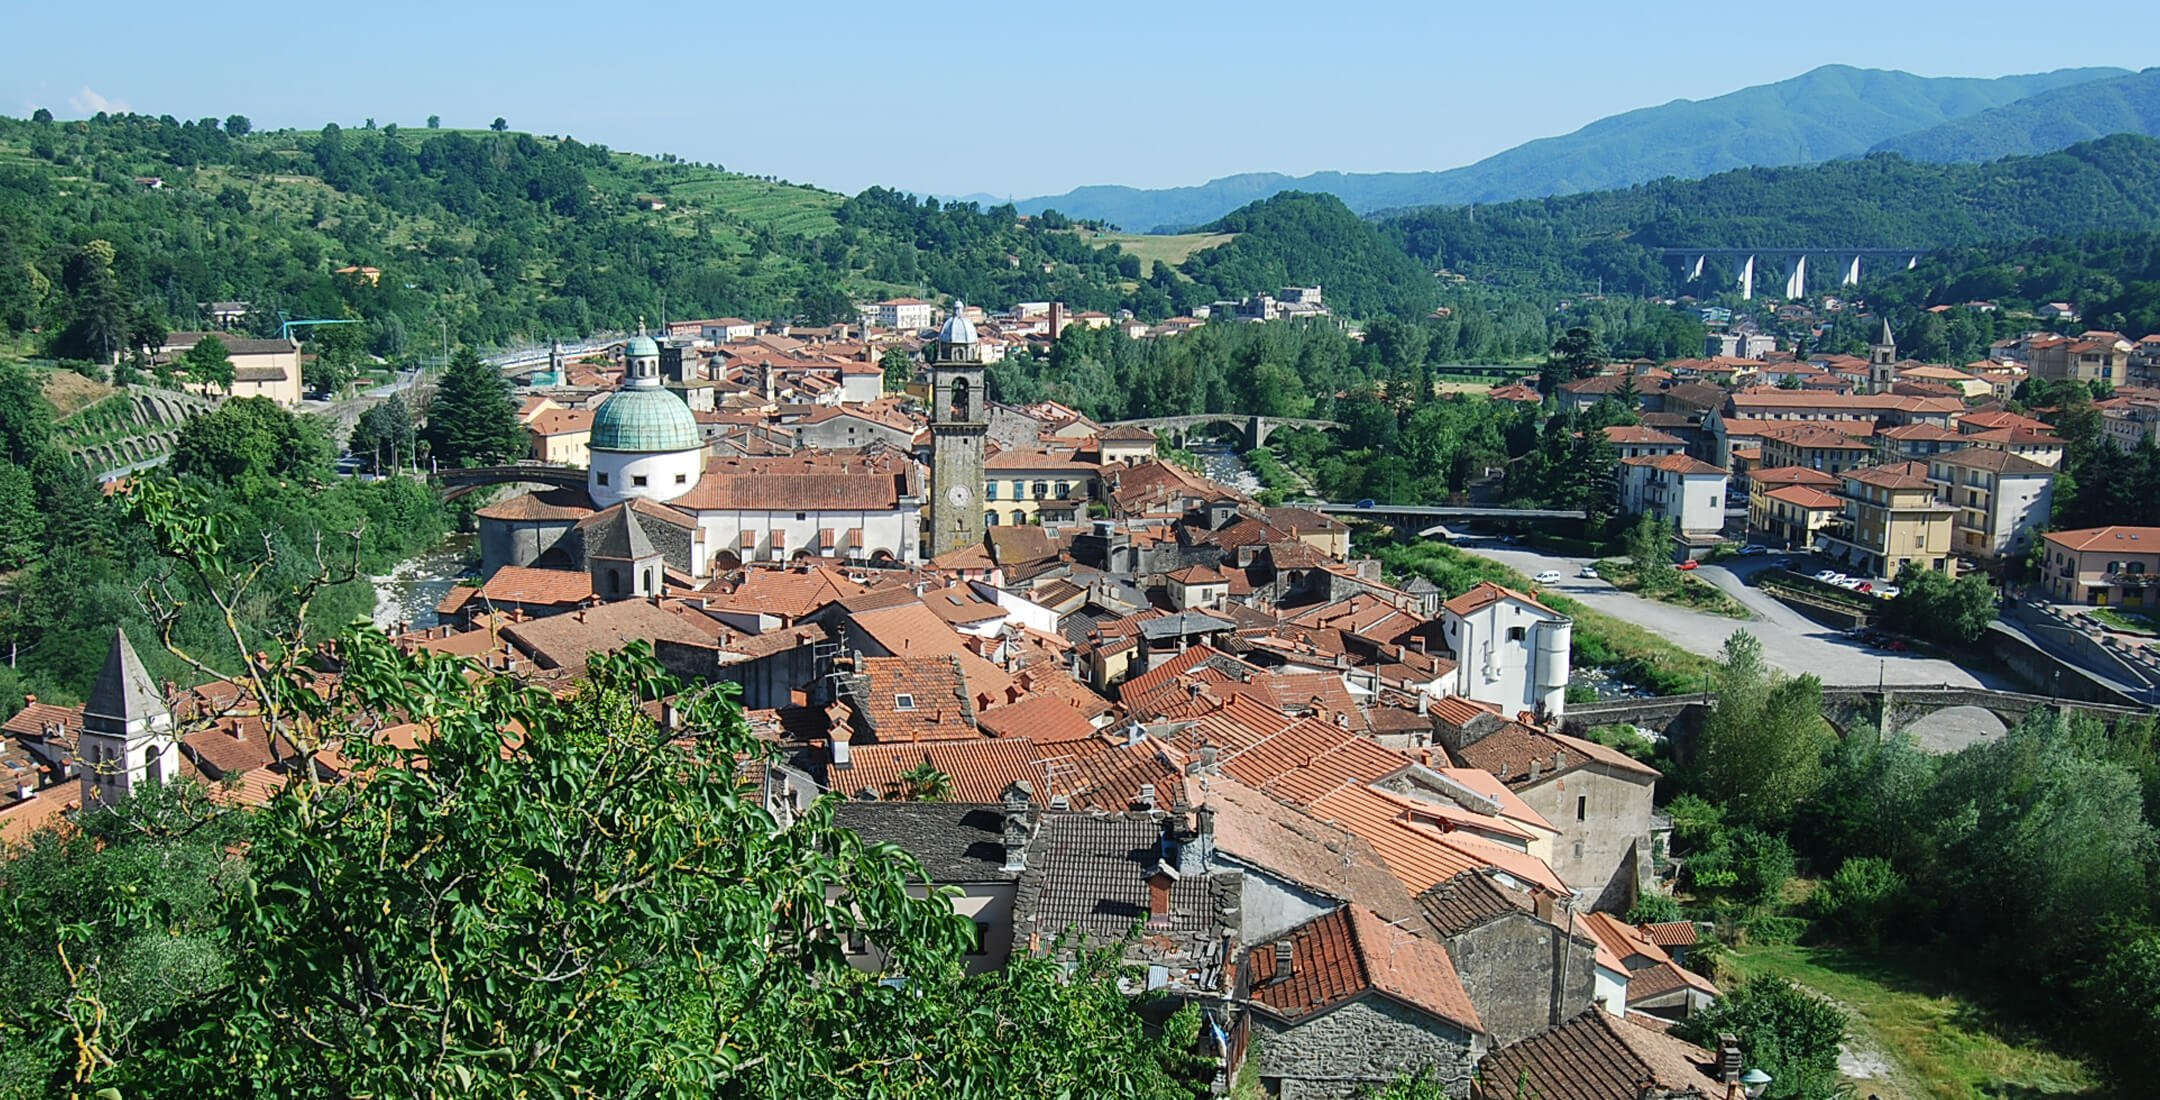 Borgo di Pontremoli